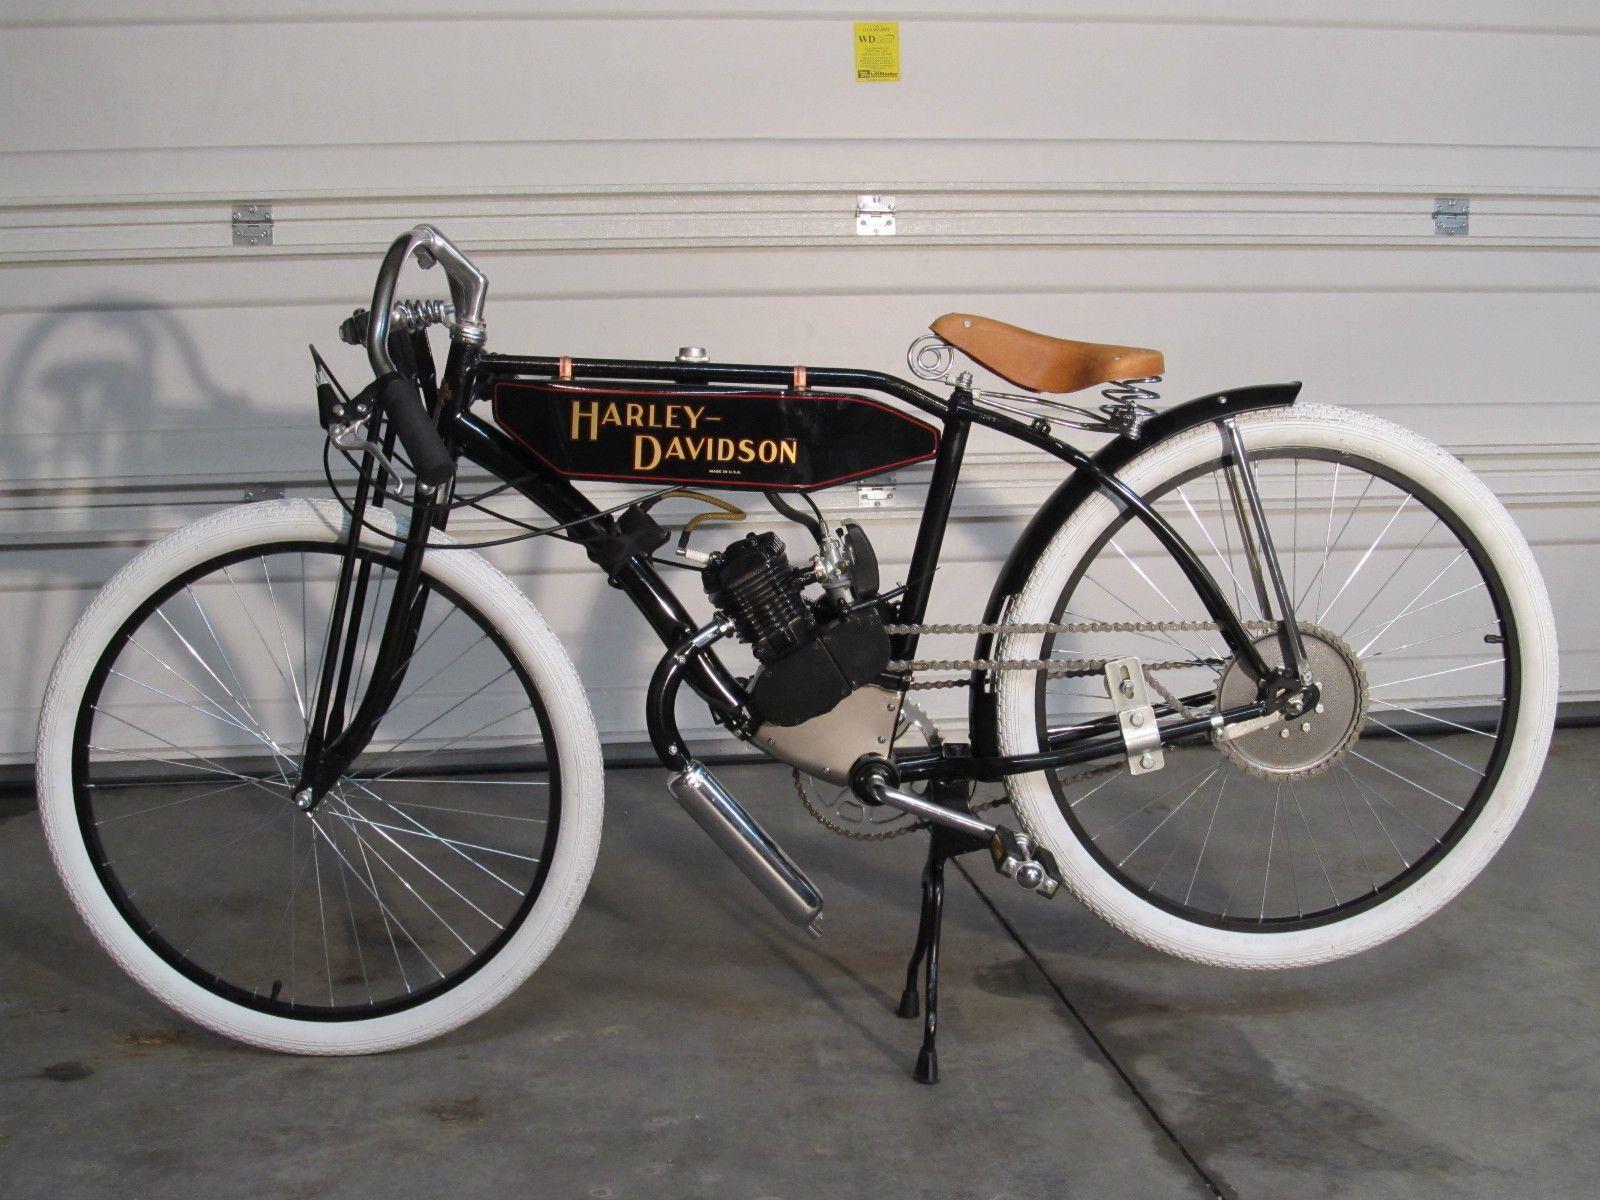 Harley Davidson Boardtrack Racer Replica Motorised Bike Vintage Bikes Motorcycles Motorized Bicycle